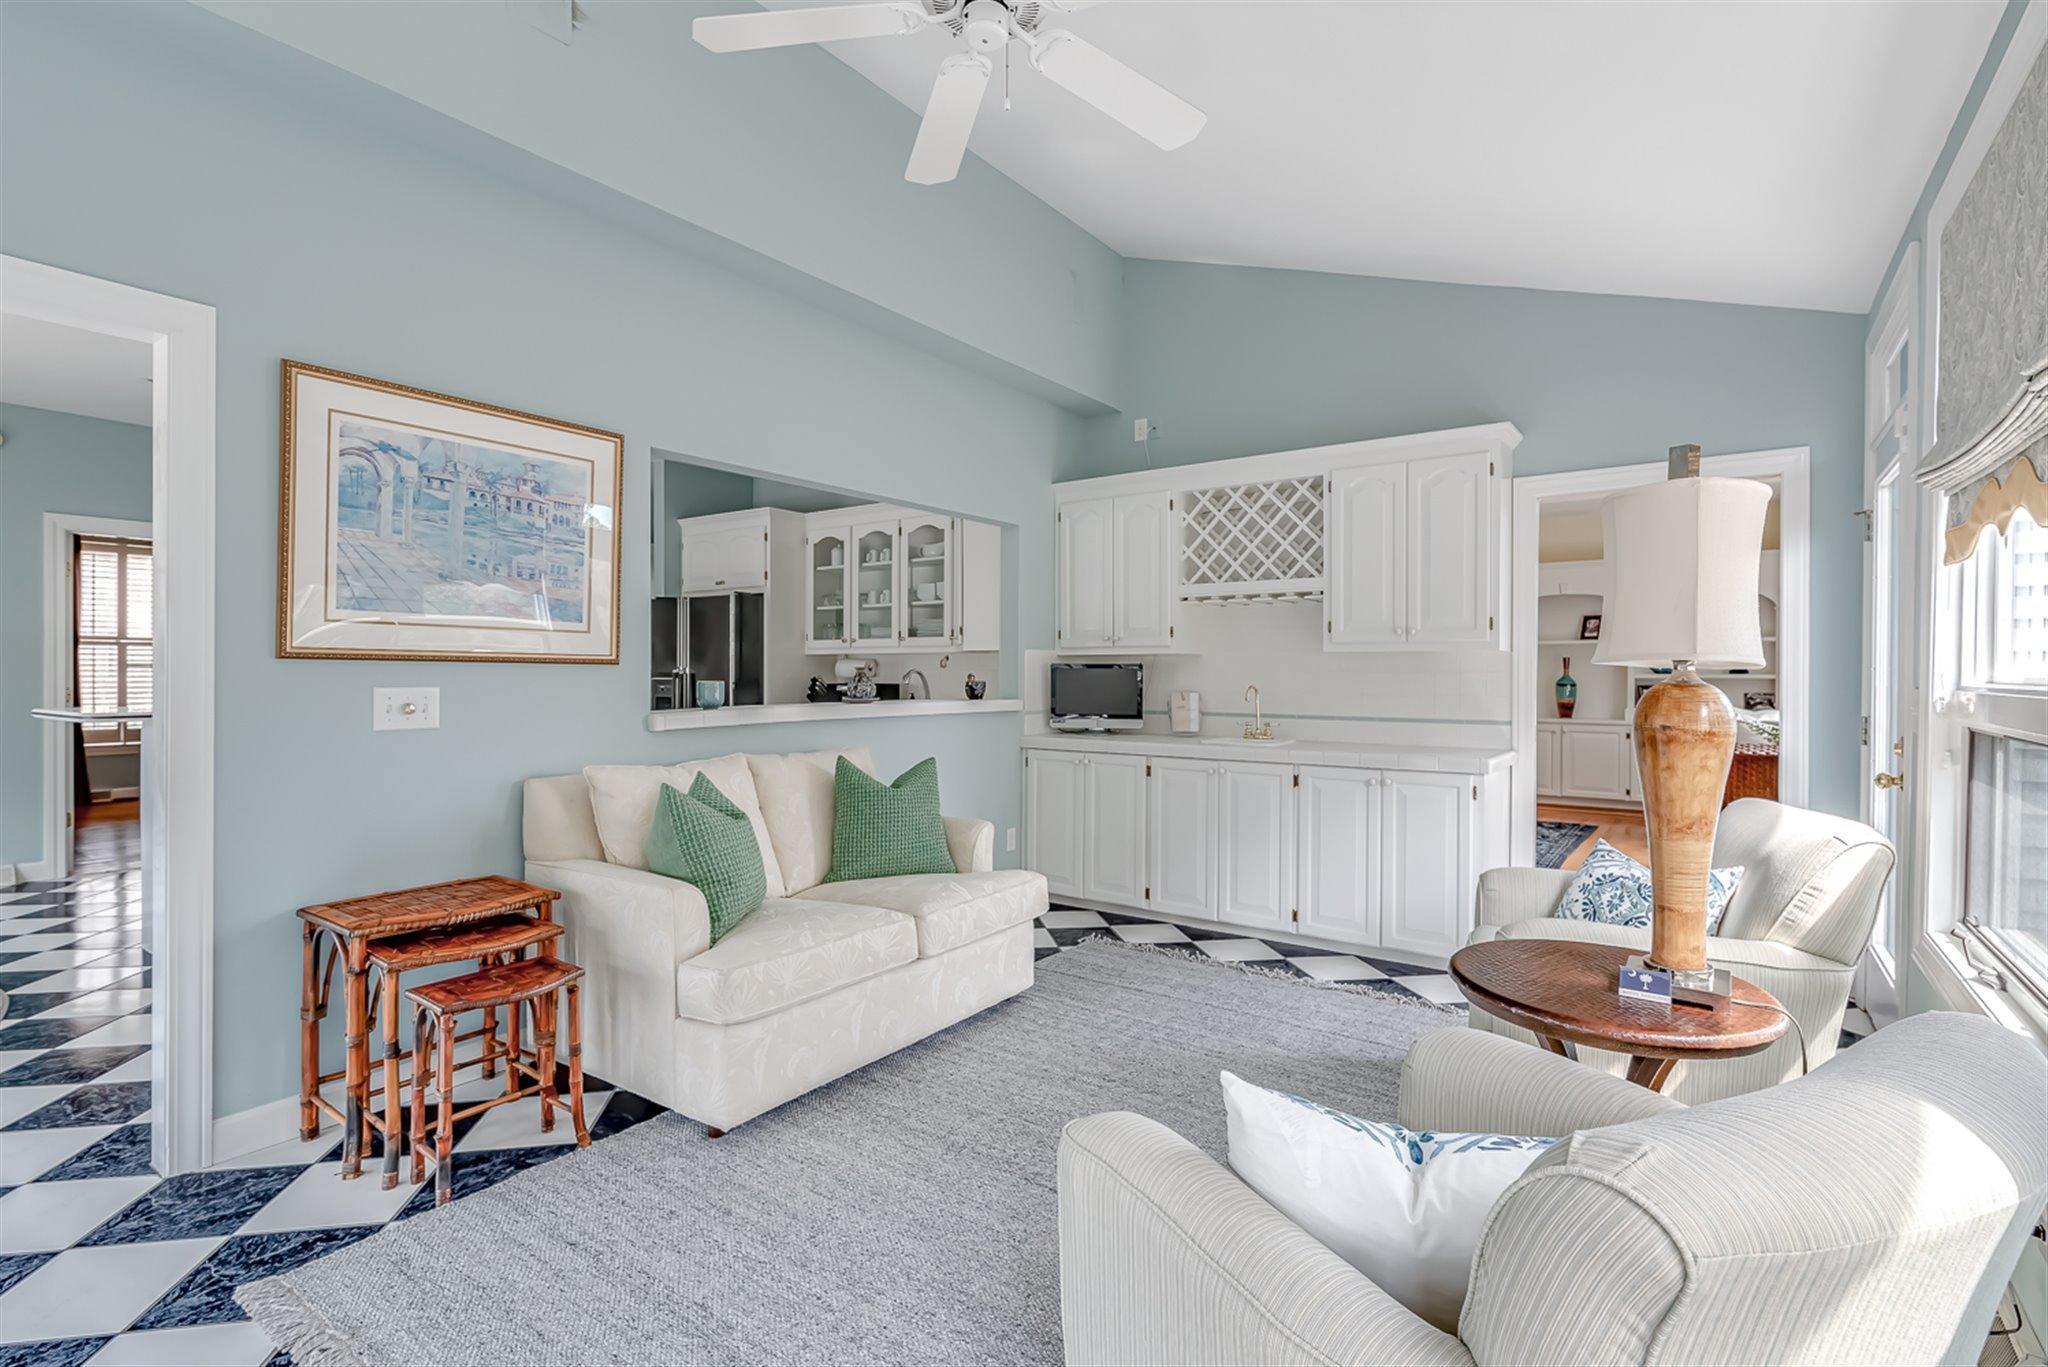 Indigo Point Homes For Sale - 50 Indigo Point, Charleston, SC - 21